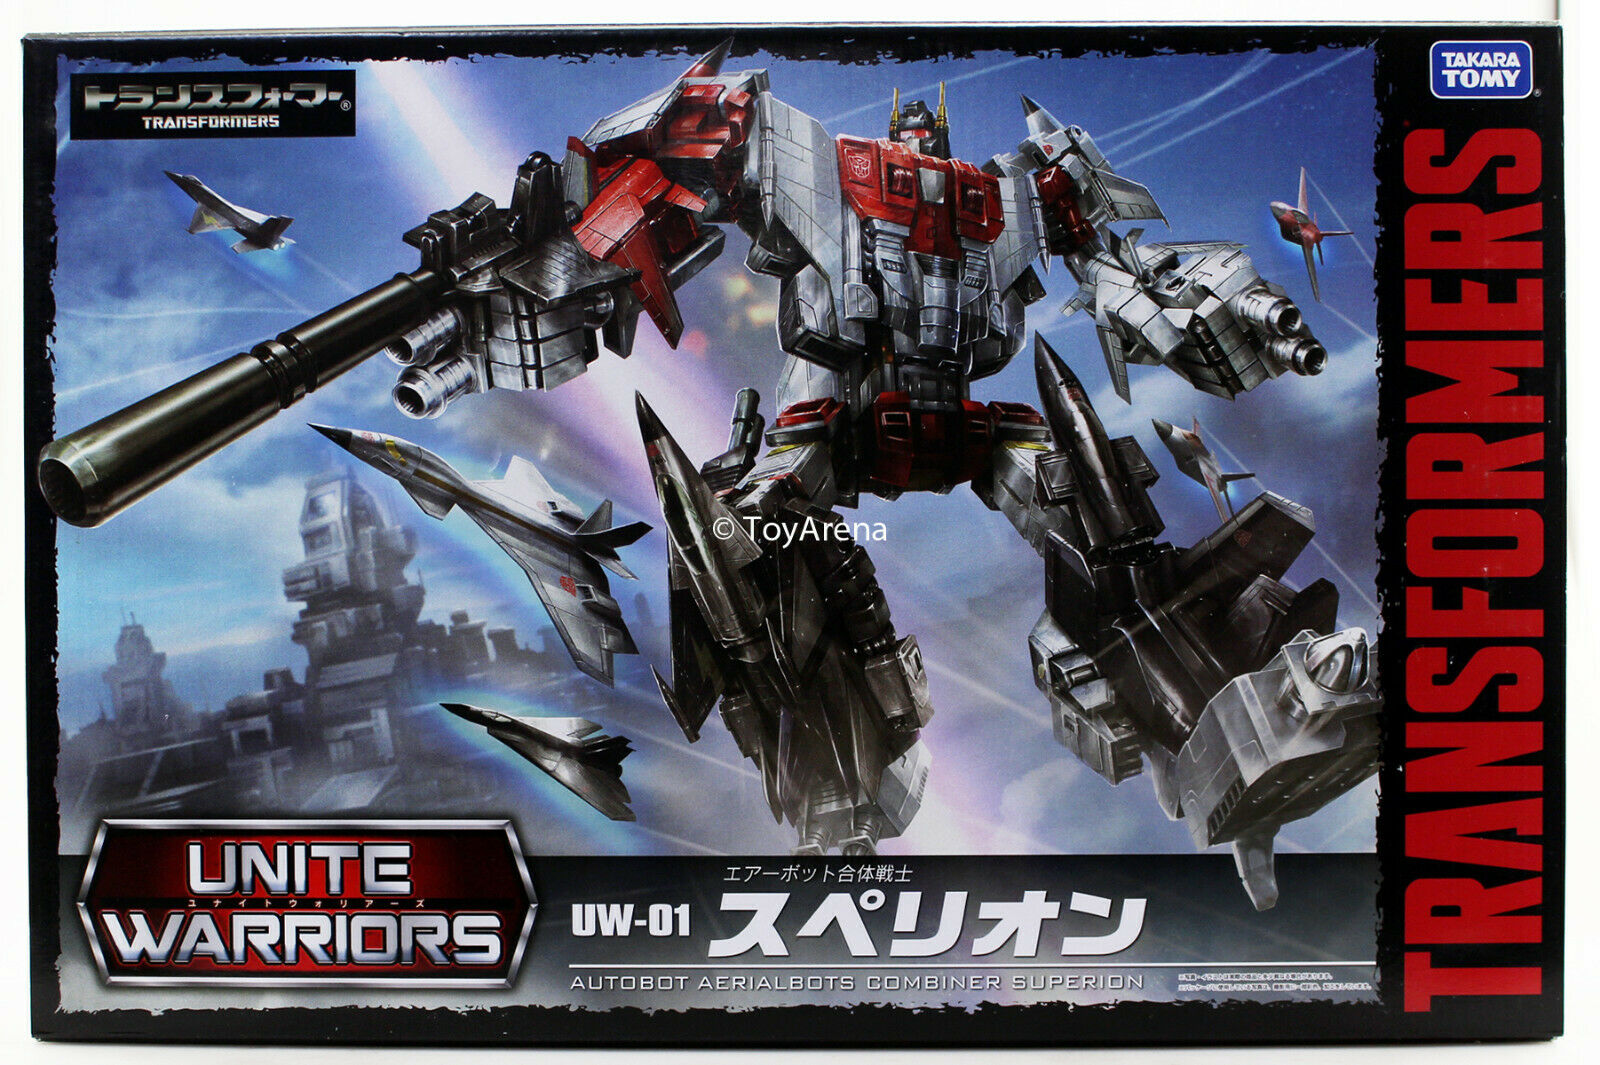 Transformers unire Guerrieri UW01 Superion Aerialbot COMBINATORE USA IN MAGAZZINO